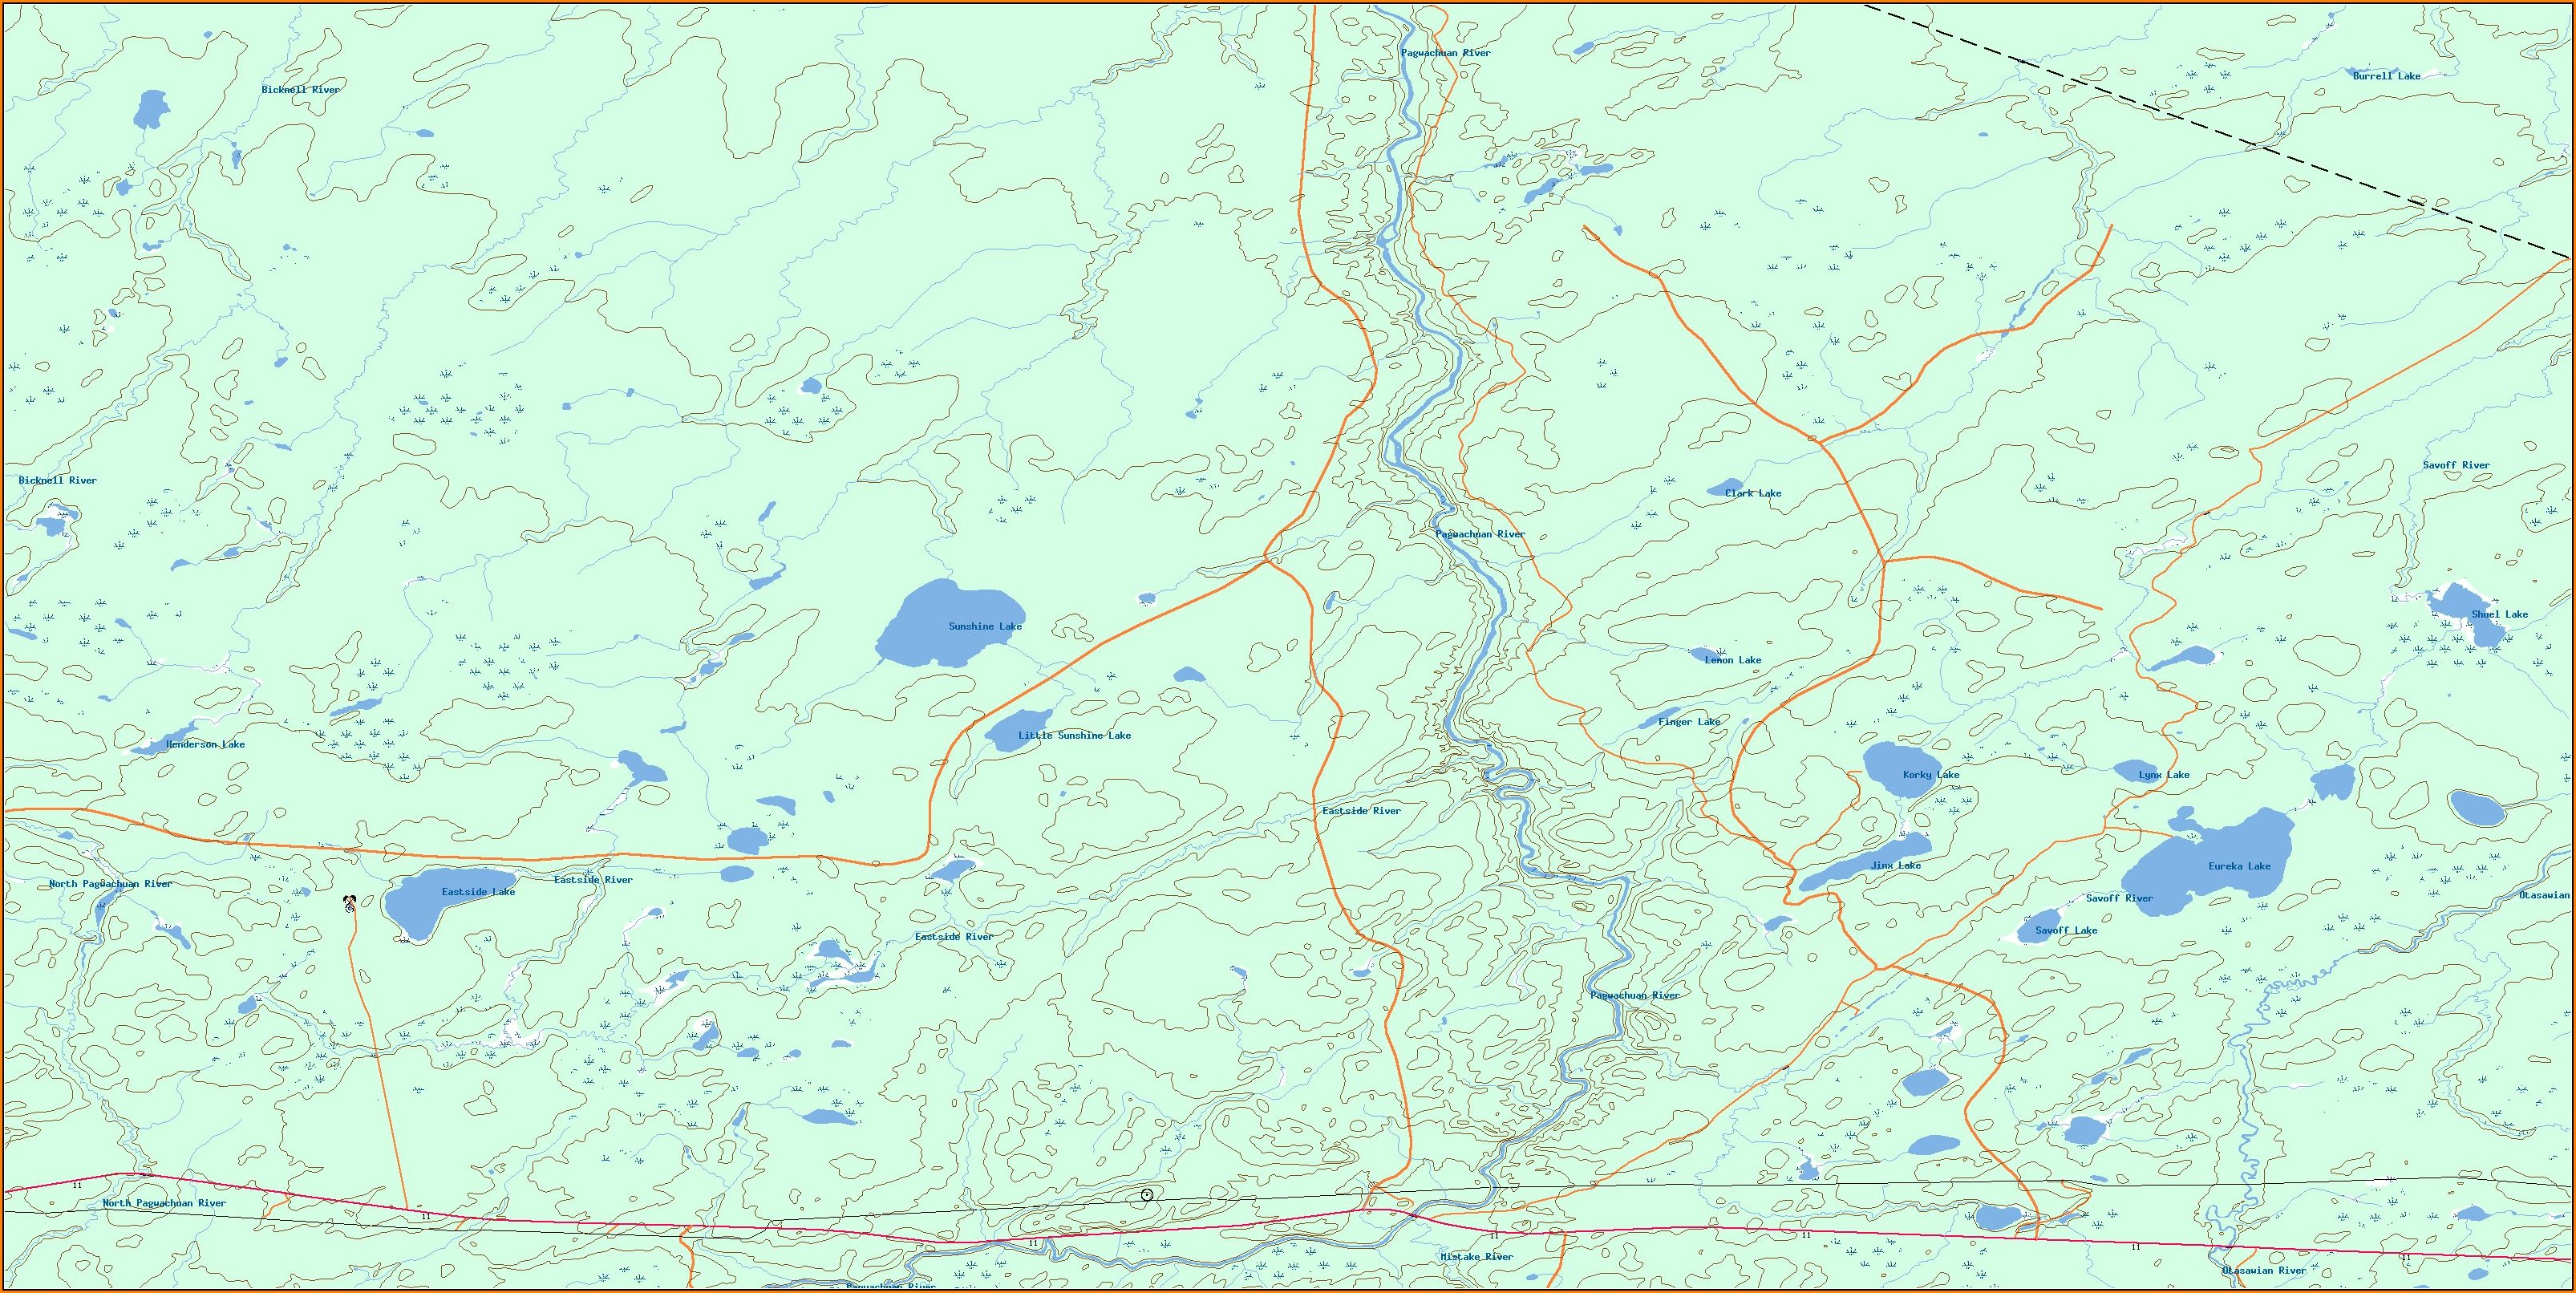 Lake Topo Maps Free